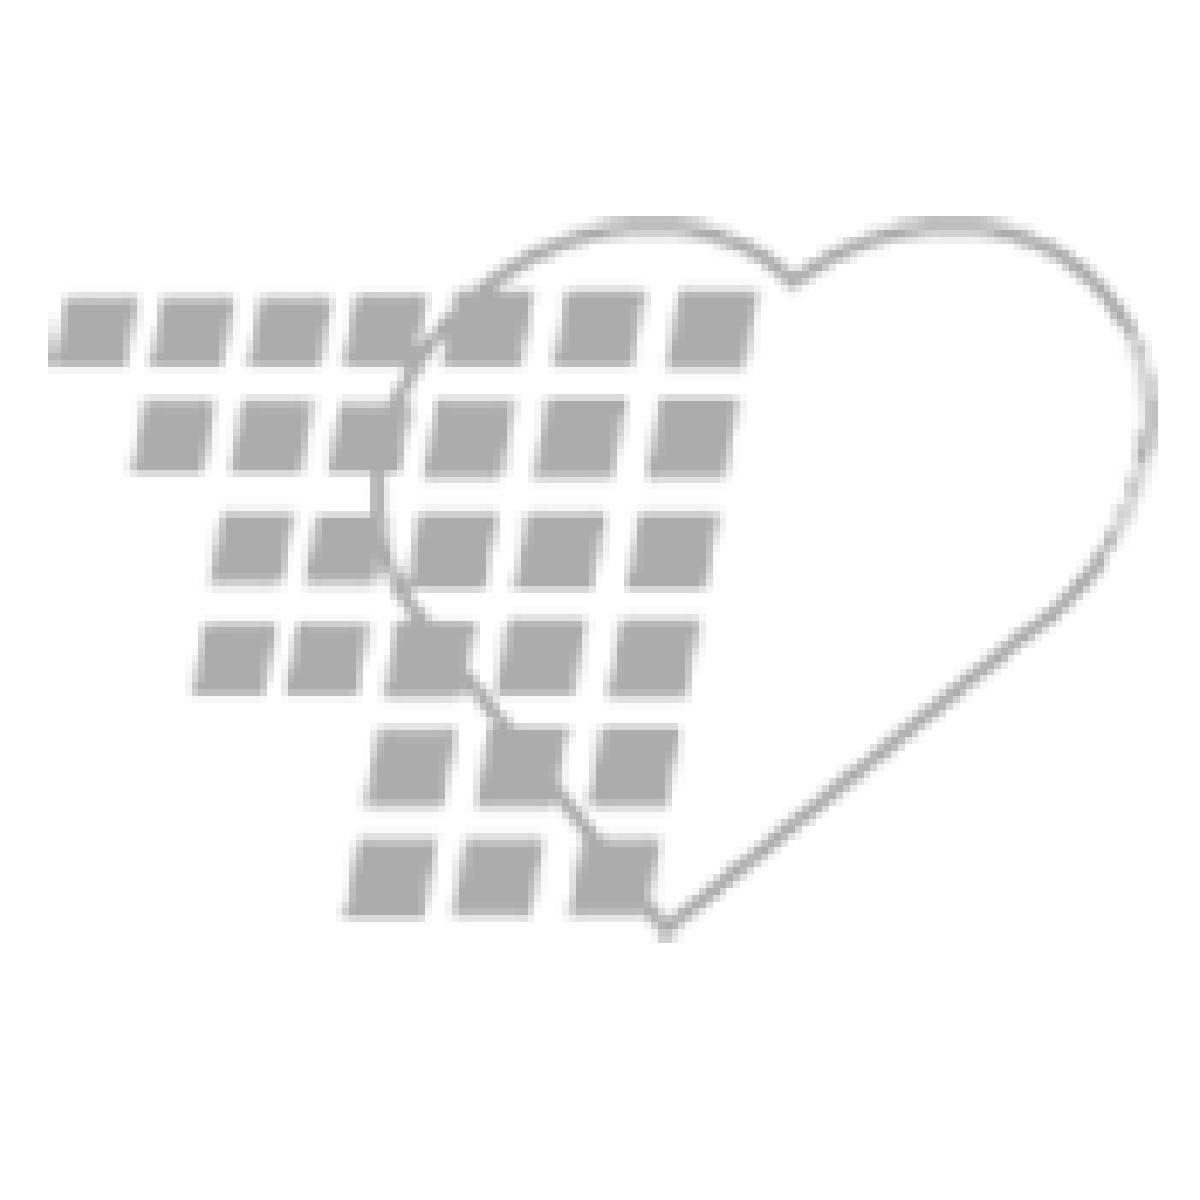 04-25-3127 SimCartRx Elite